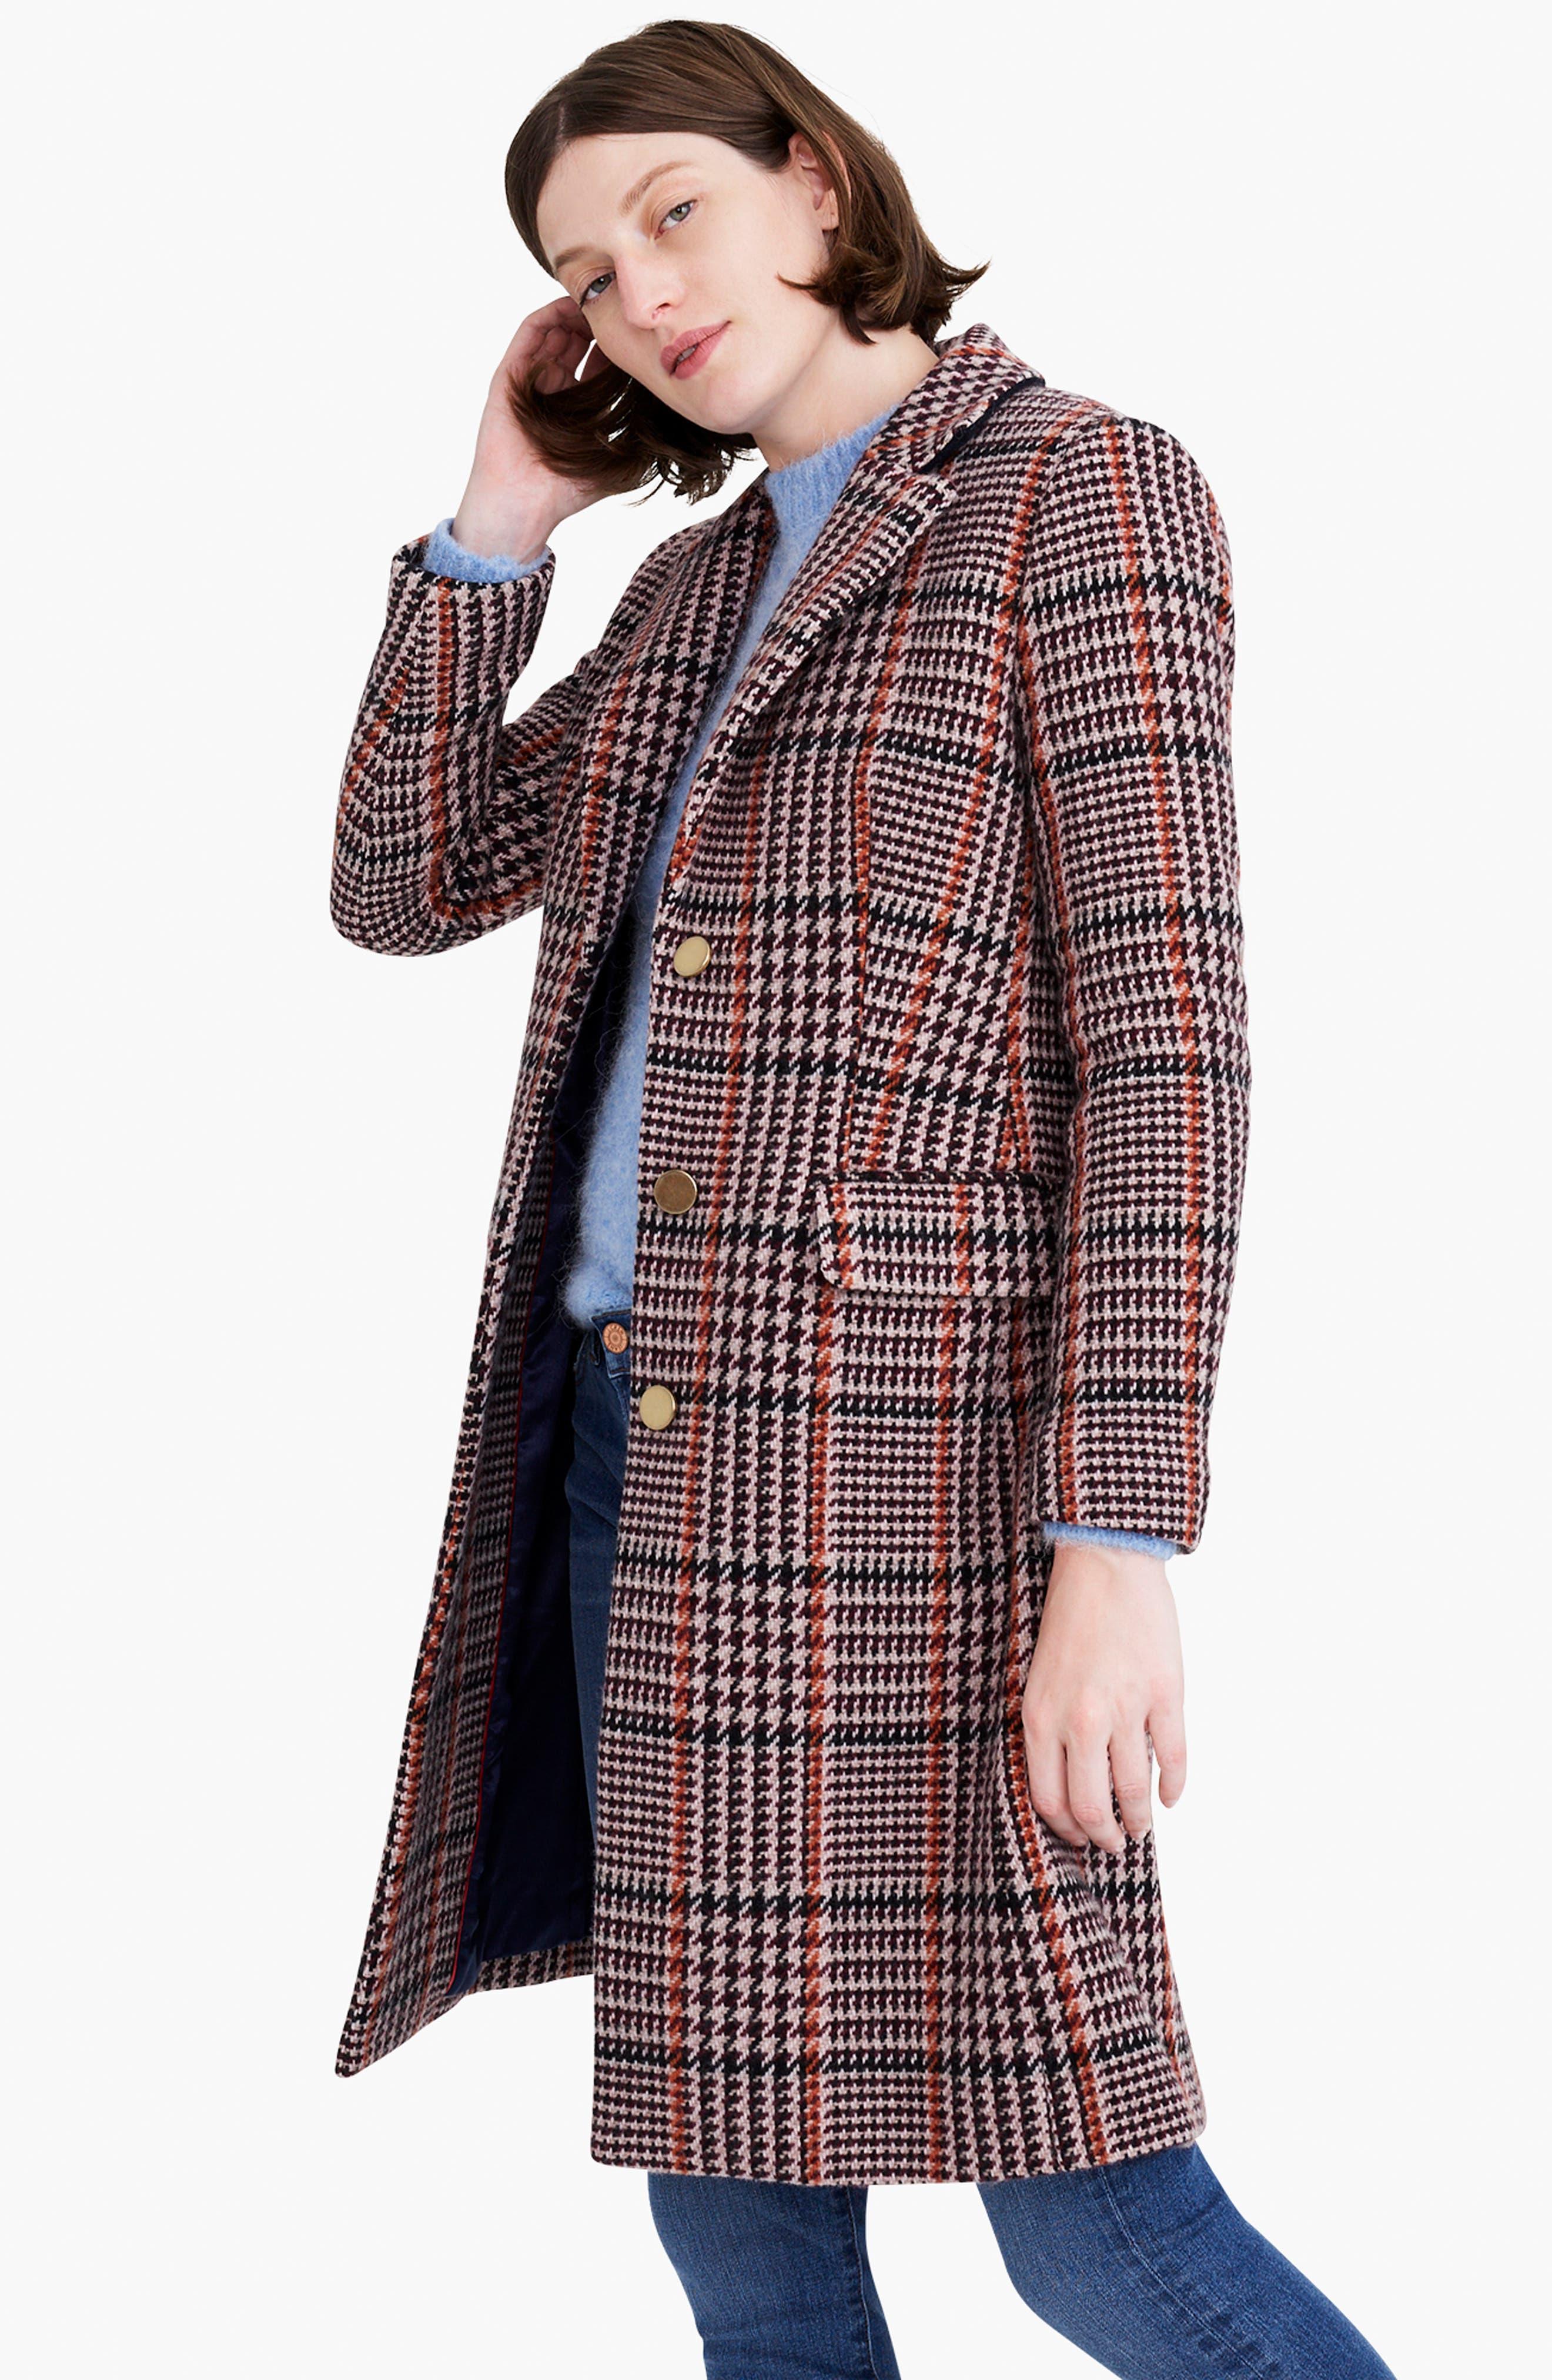 Plaid Single Breasted Topcoat,                             Alternate thumbnail 10, color,                             CABERNET PLAID